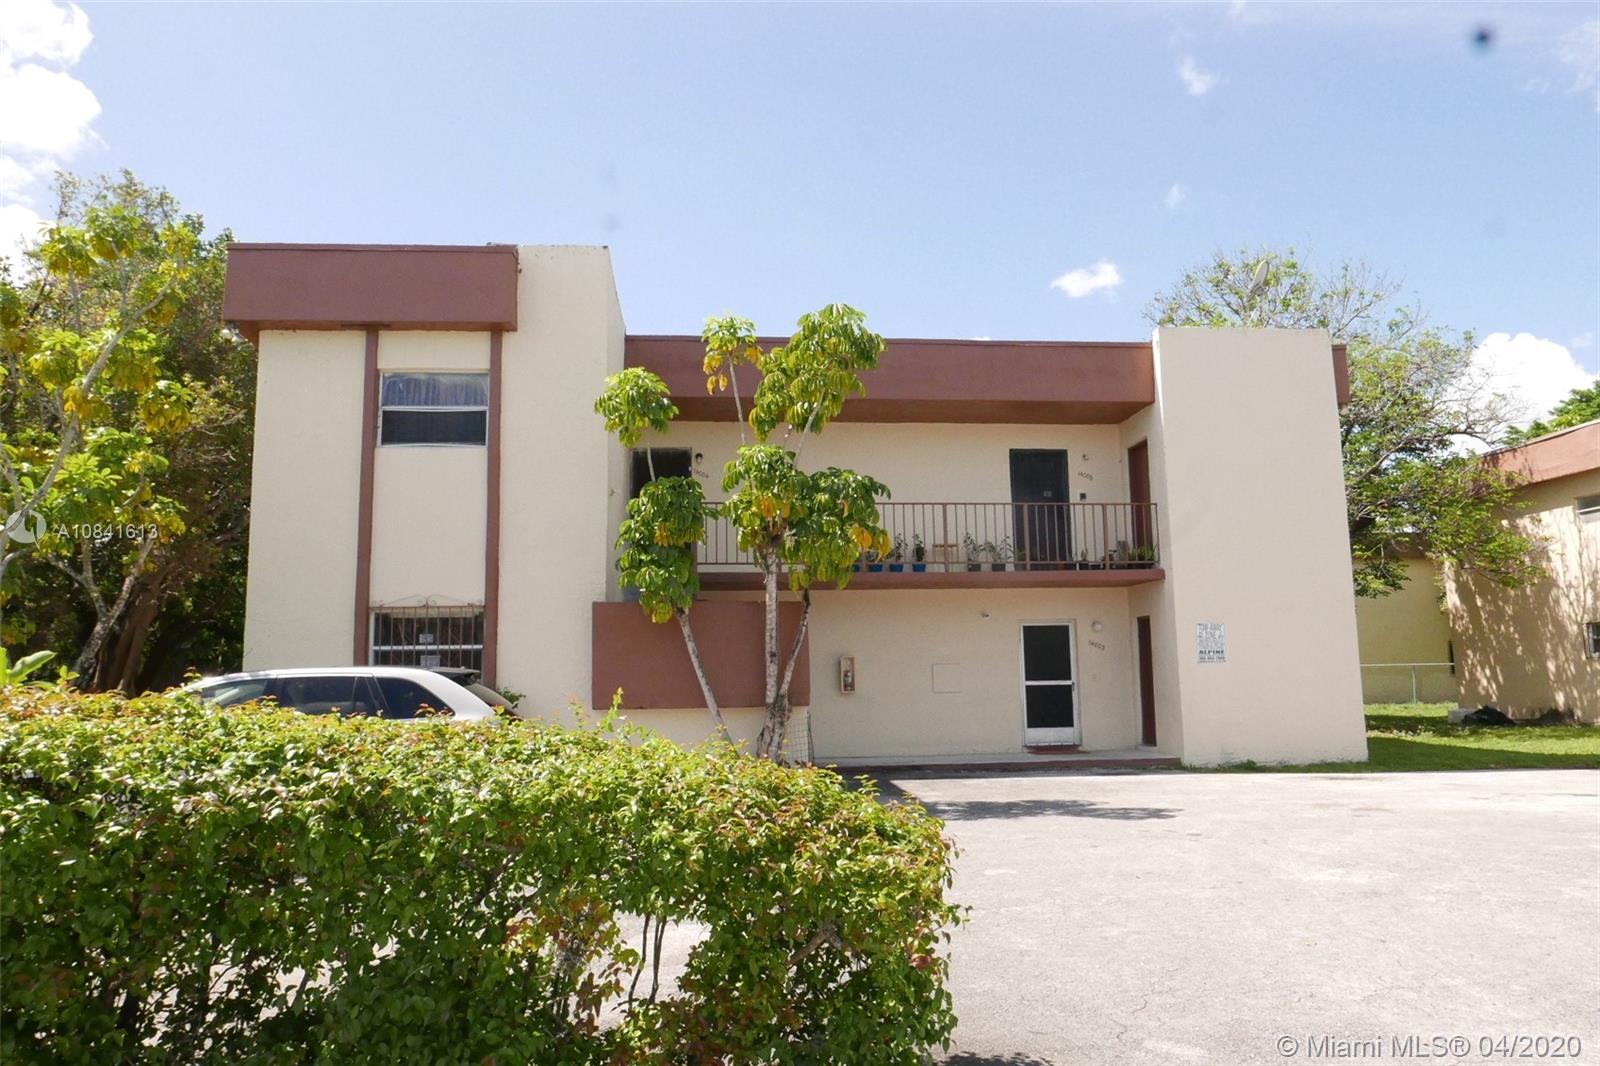 14000 NE 2nd Ct, Miami Shores, Florida